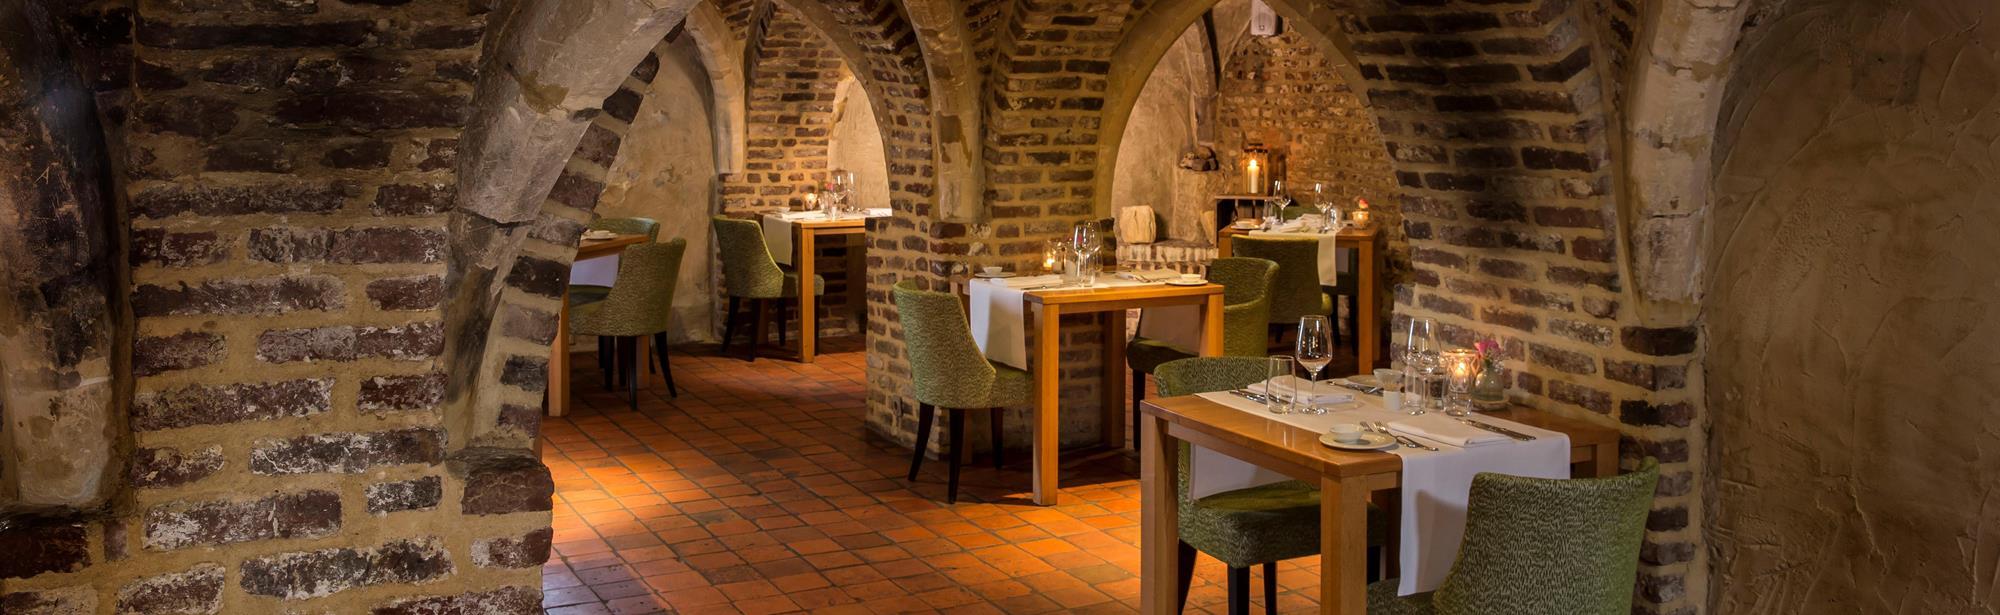 Luigi's Restaurant & Bar